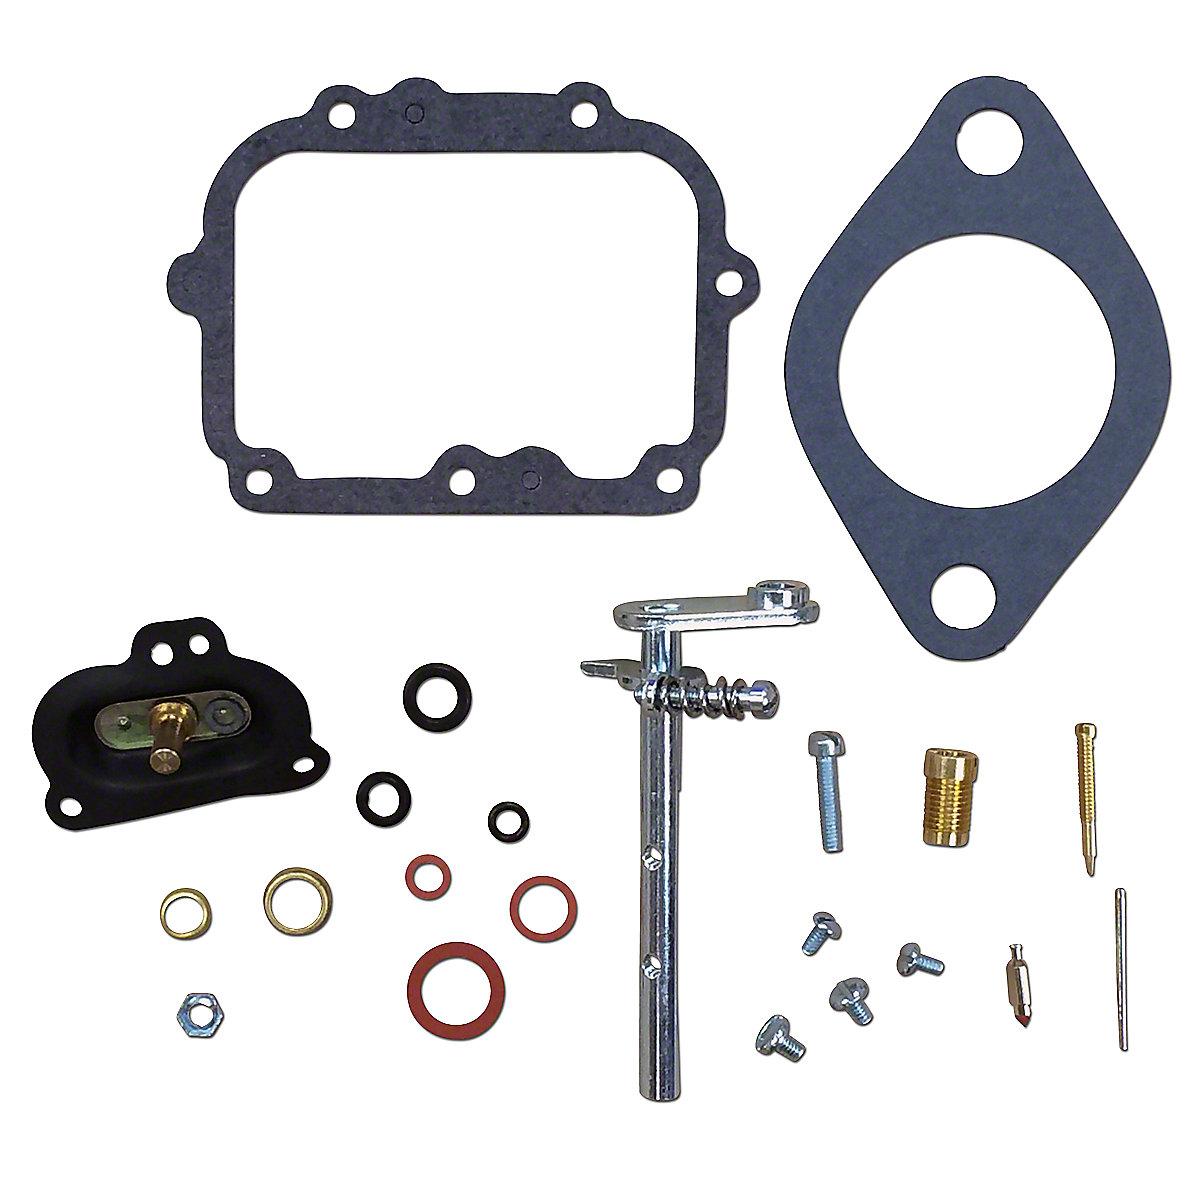 Basic Carburetor Repair Kit For Marvel Schebler Carburetors. Fits Oliver 1750, 1800 and 1850 All With Marvel Schebler Carburetor Numbers USX29, USX32-1, USX37, USX44. KIT CONTAINS: THROTTLE SHAFT, NEEDLE & SEAT, FLOAT LEVER PIN, CHOKE & THROTTLE SHAFT SEALS, NEEDLE VALVE, ADJUSTMENT SCREW, GASKETS & INSTRUCTIONS.